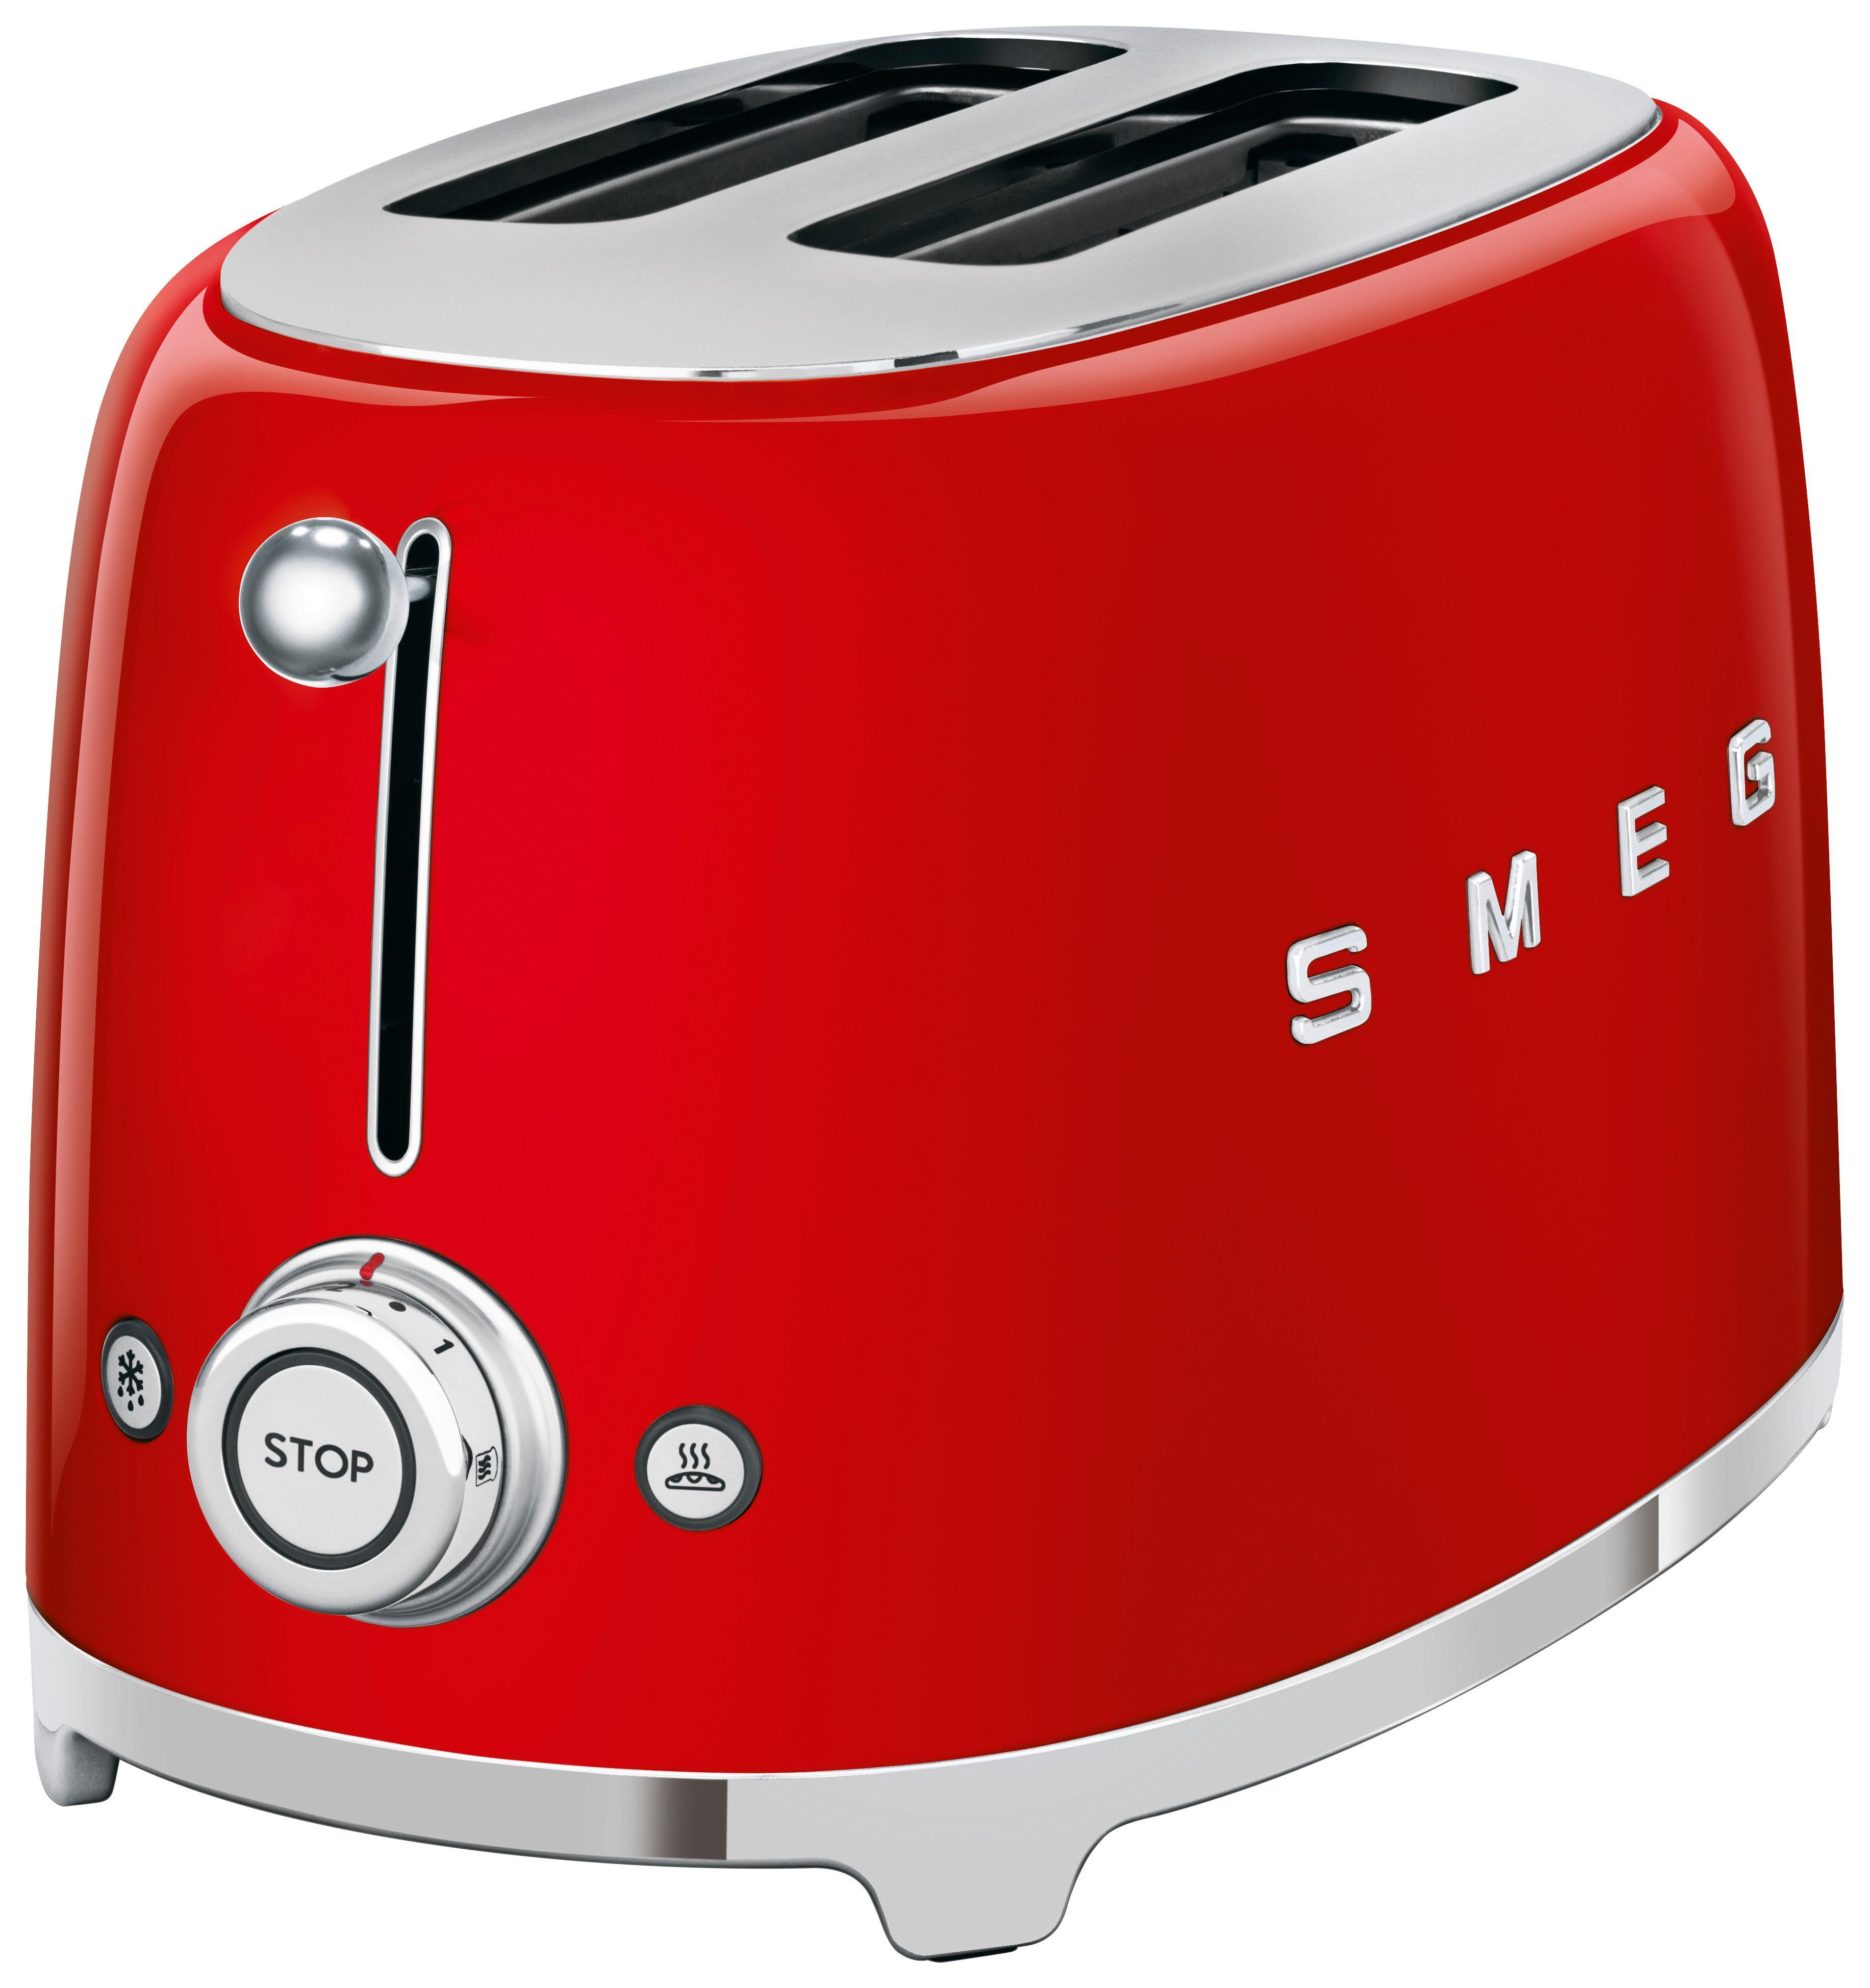 Toaster SMEG TSF01RDEU Rot   Küche und Esszimmer > Küchengeräte > Toaster   SMEG